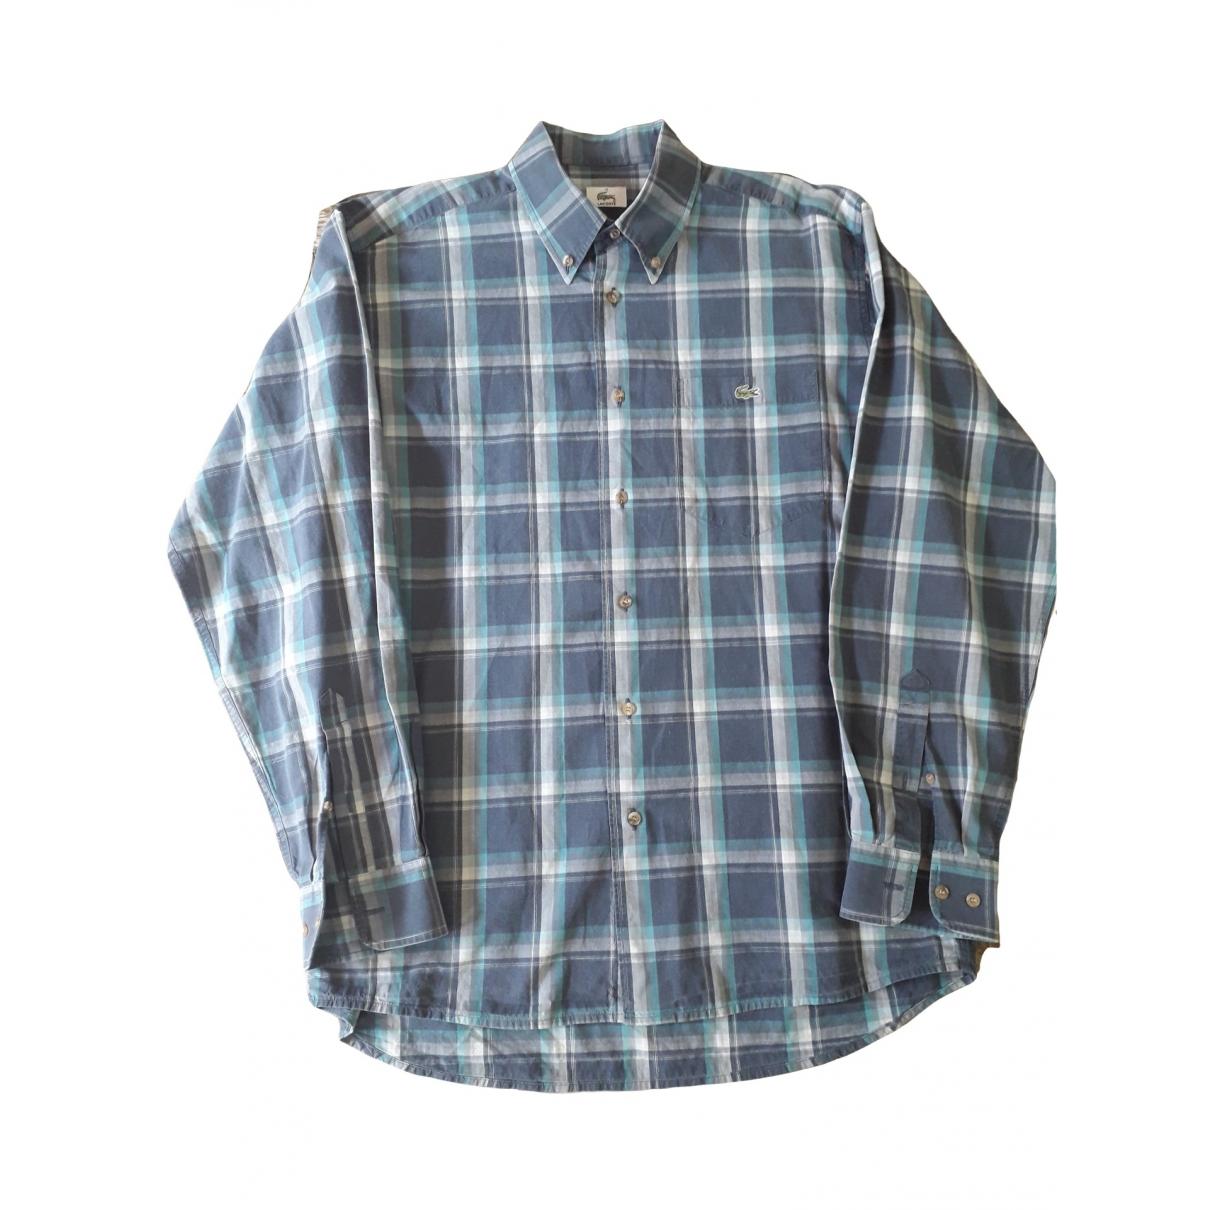 Lacoste \N Multicolour Cotton Shirts for Men 40 EU (tour de cou / collar)